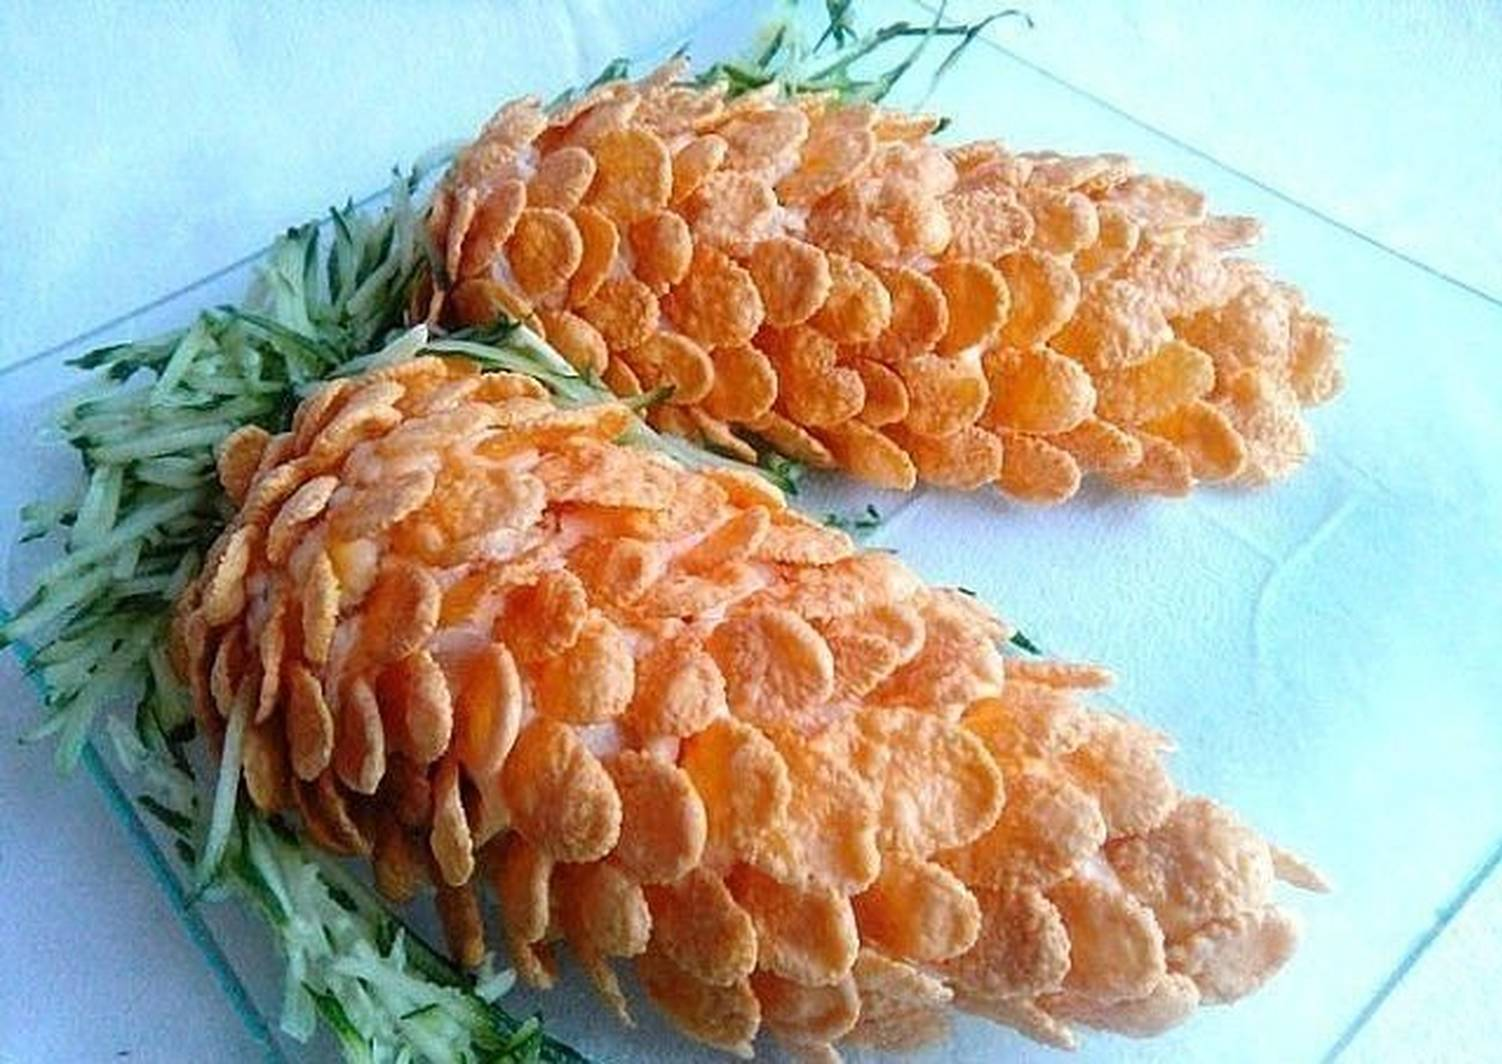 орех салат лесные шишки рецепт с фото шунинг учун ?ам